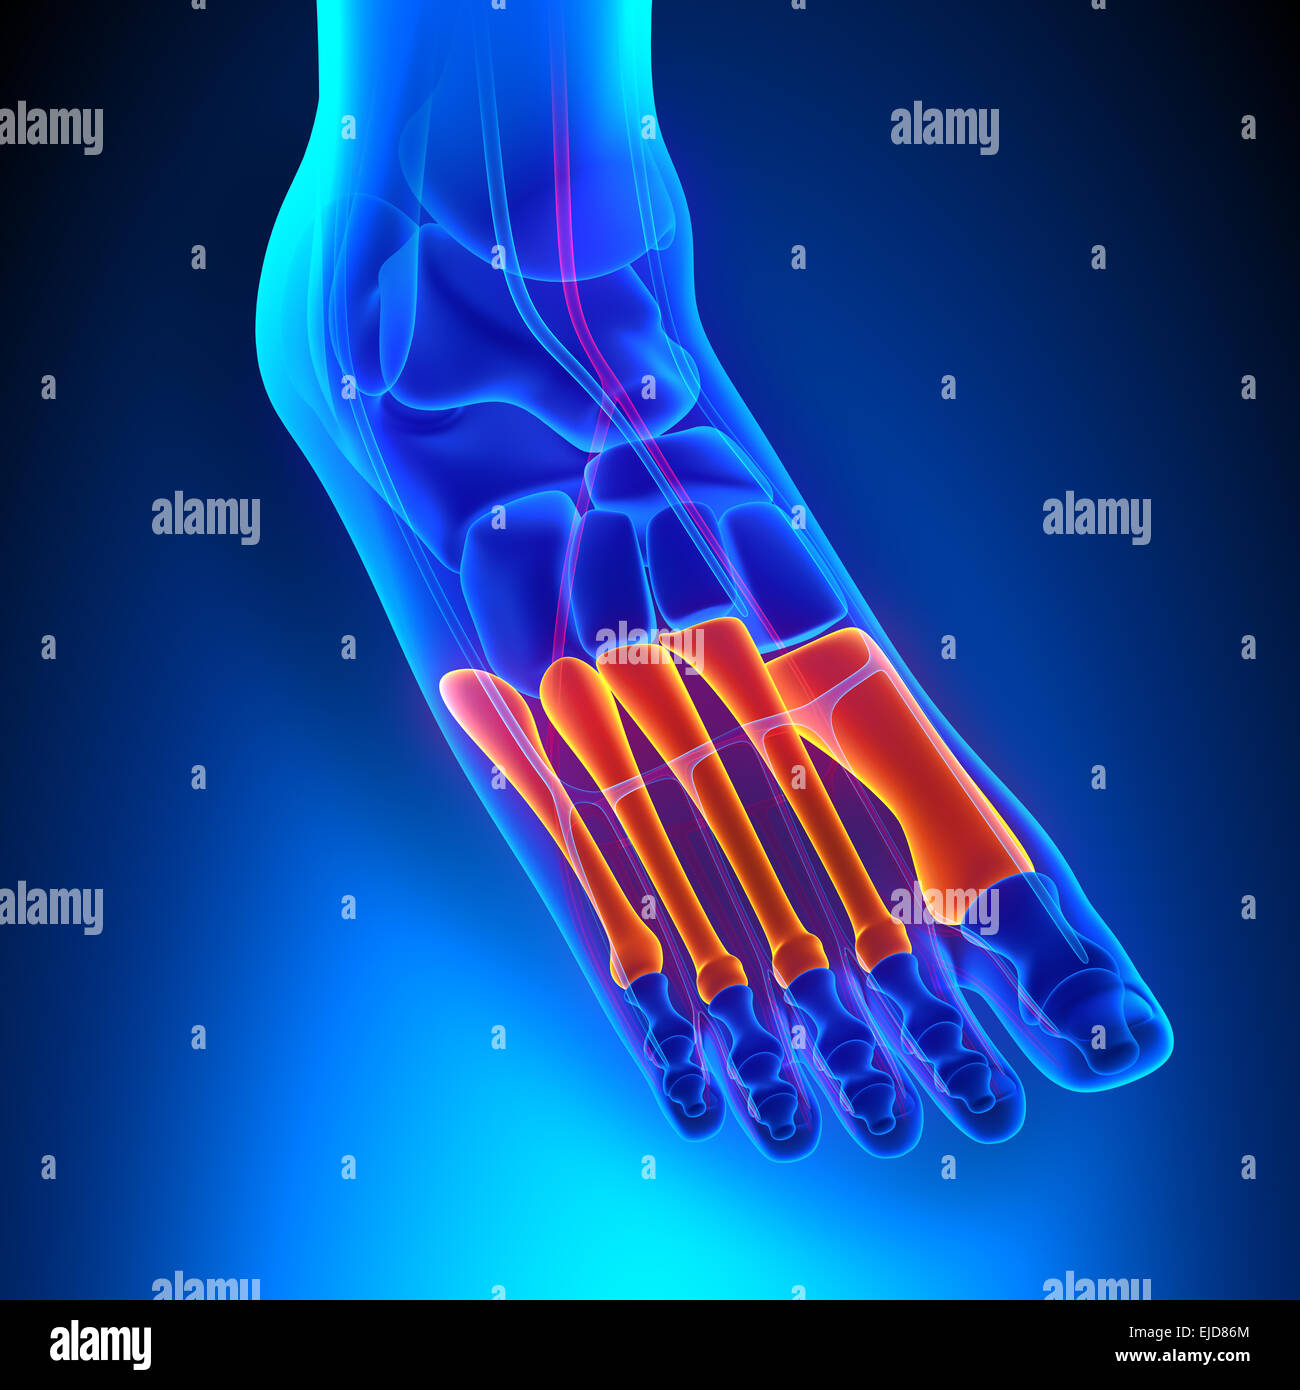 Metatarsals Bones Anatomy with Circulatory System - Stock Image